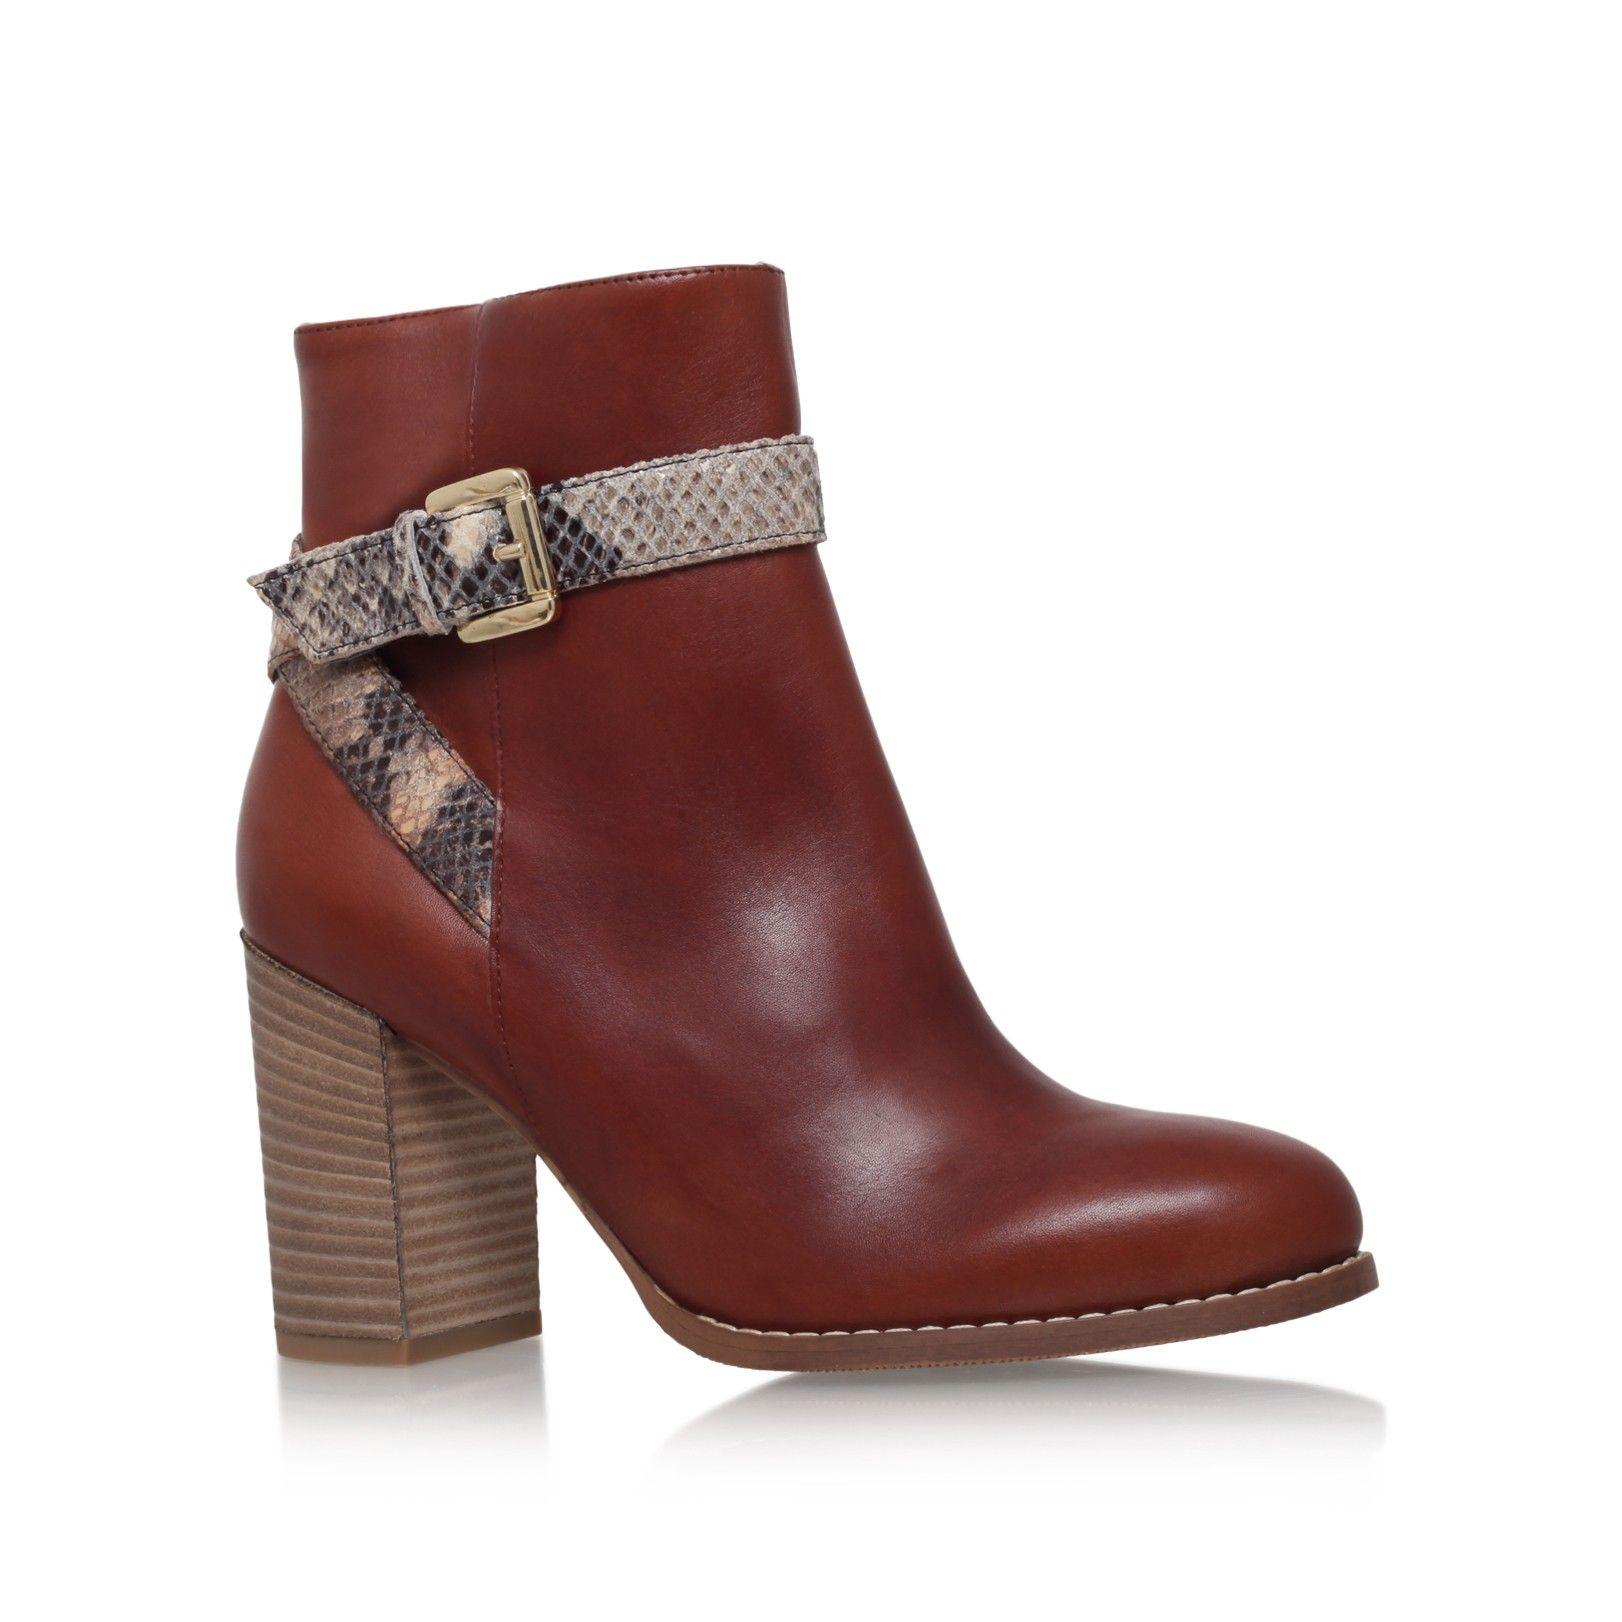 432b3282f78 slip tan mid heel ankle boots from Carvela Kurt Geiger